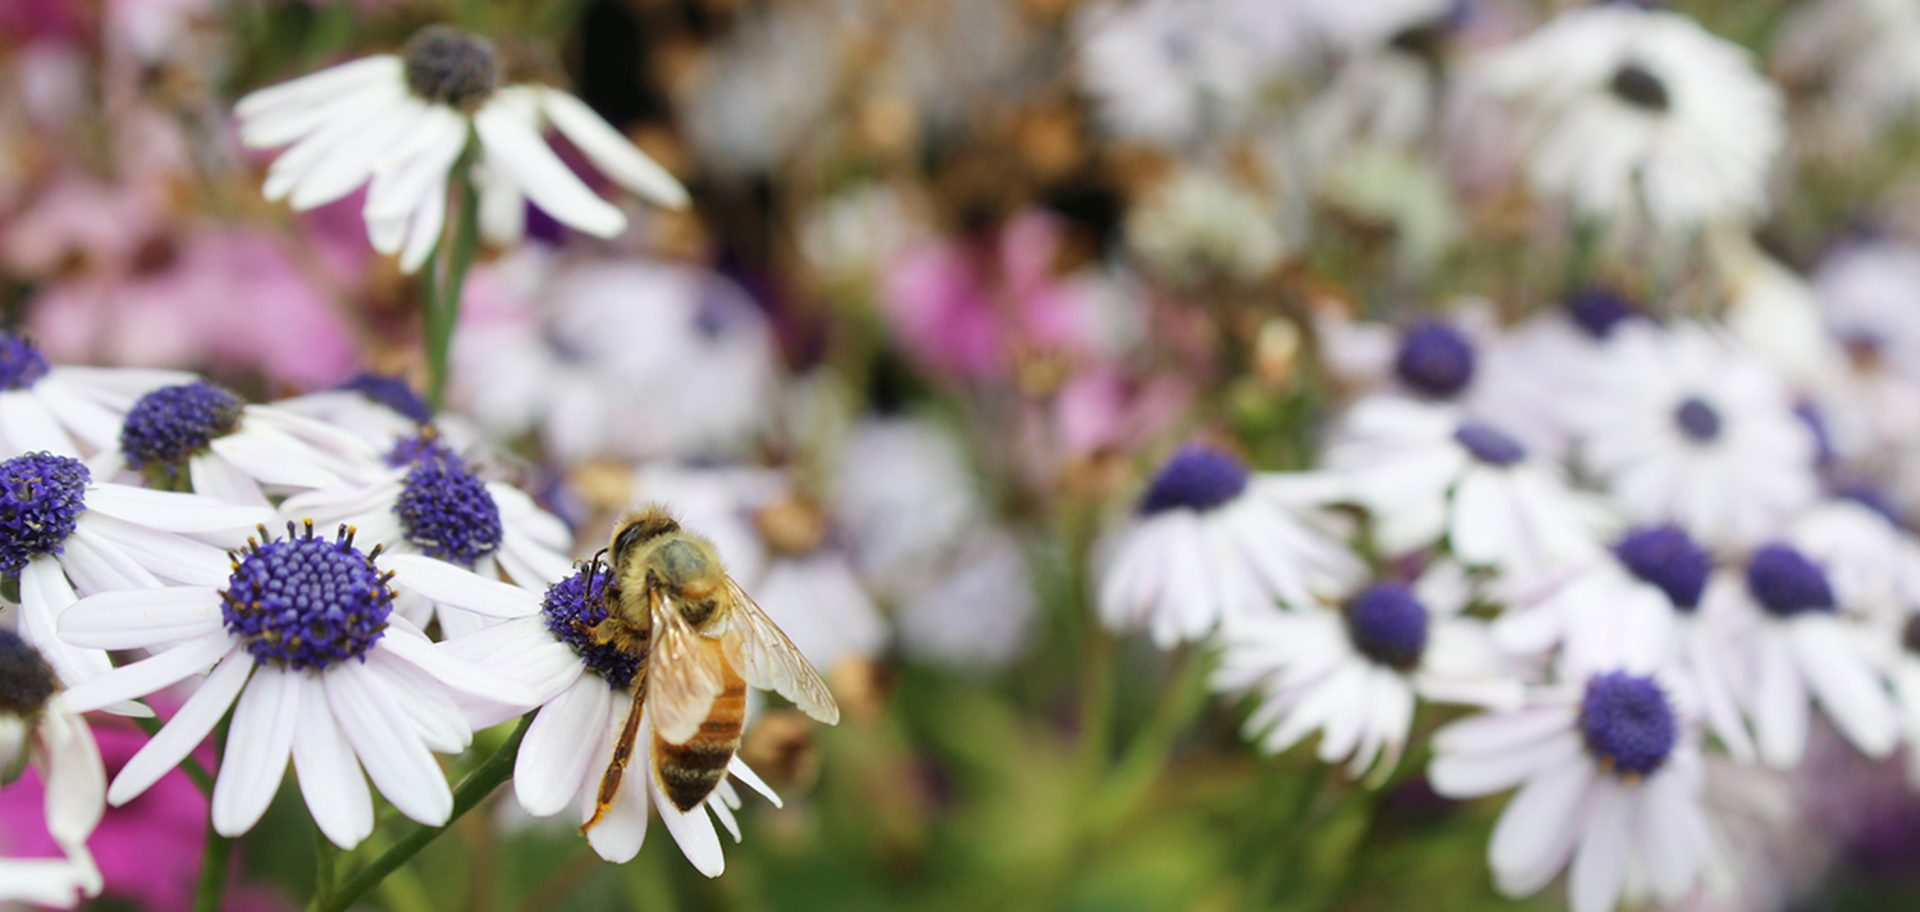 Bee Friendly Environment